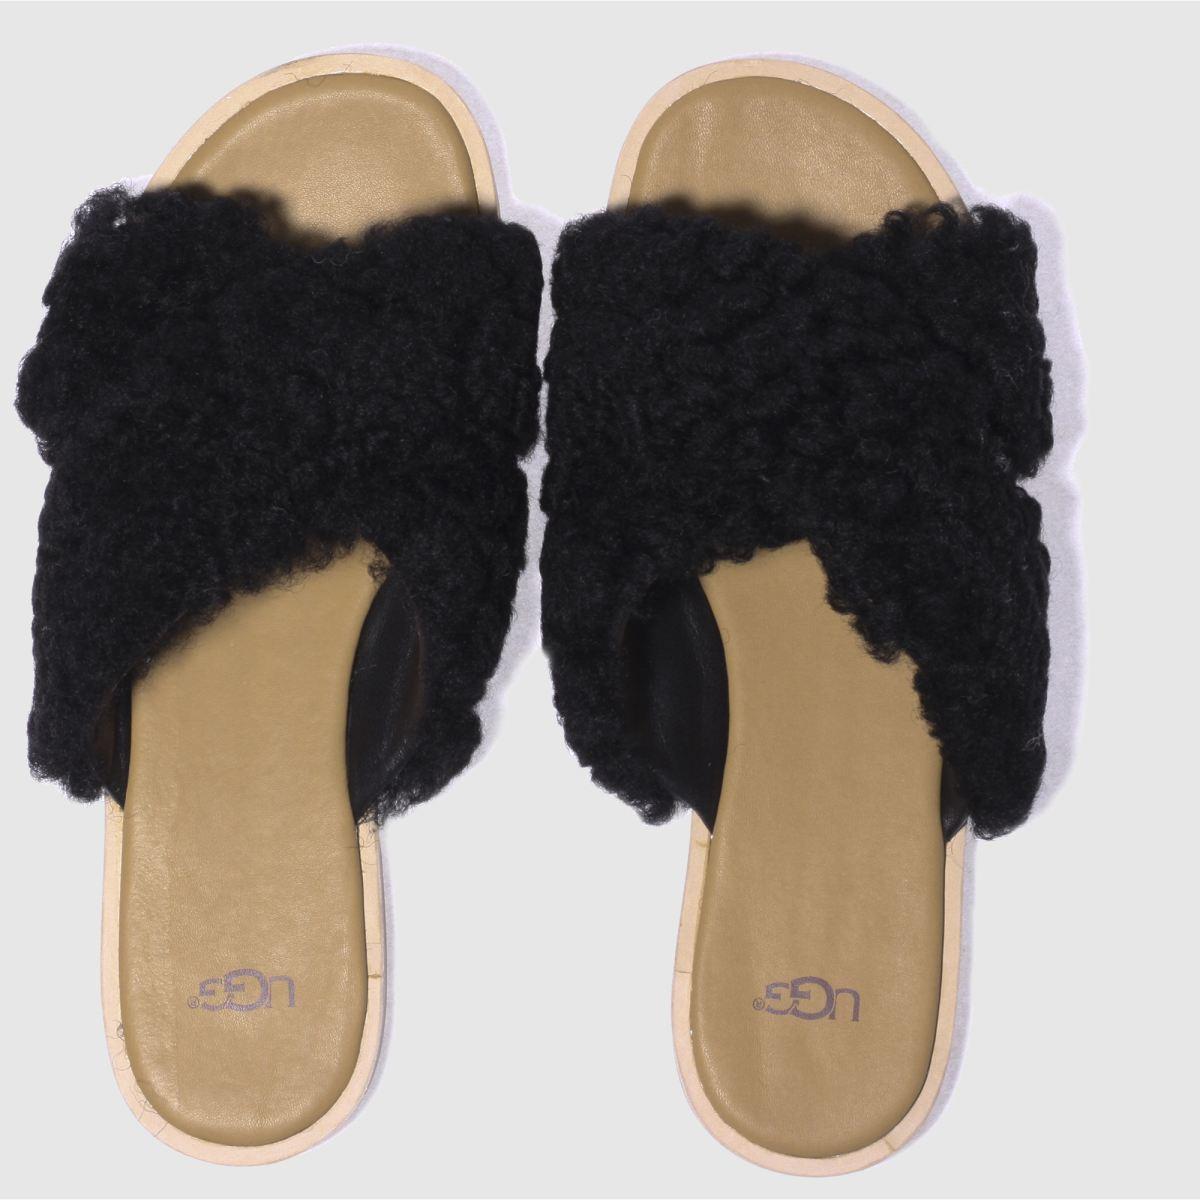 Ugg Black Joni Sandals